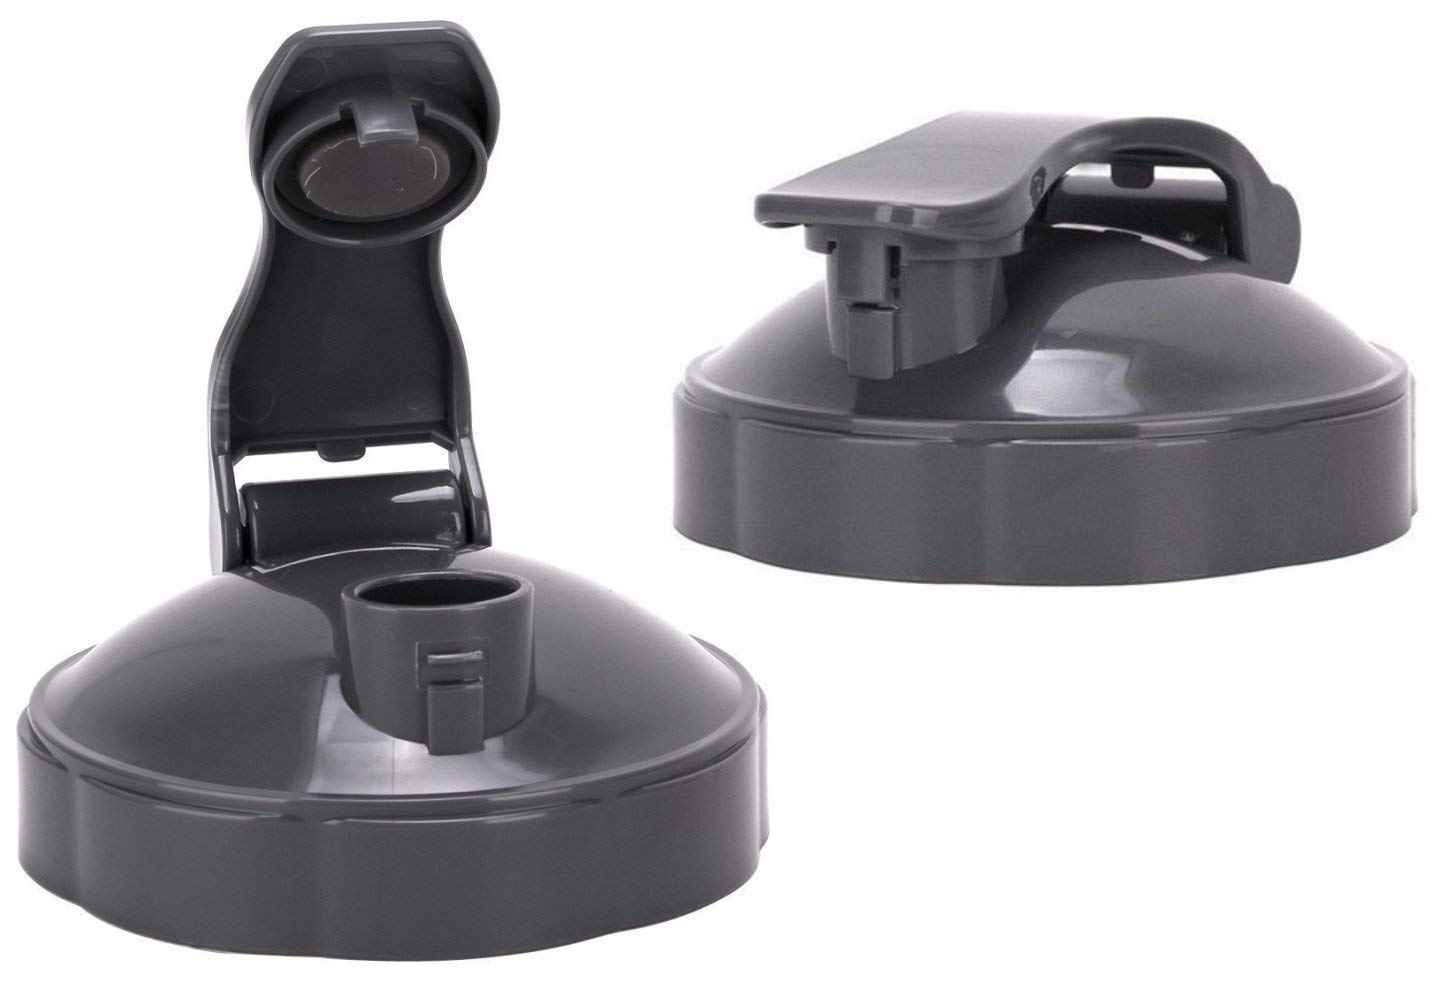 NutriBullet Flip Top To-go Lid - Premium NutriBullet Accessories & Replacement Parts (Pack of 2, Grey)